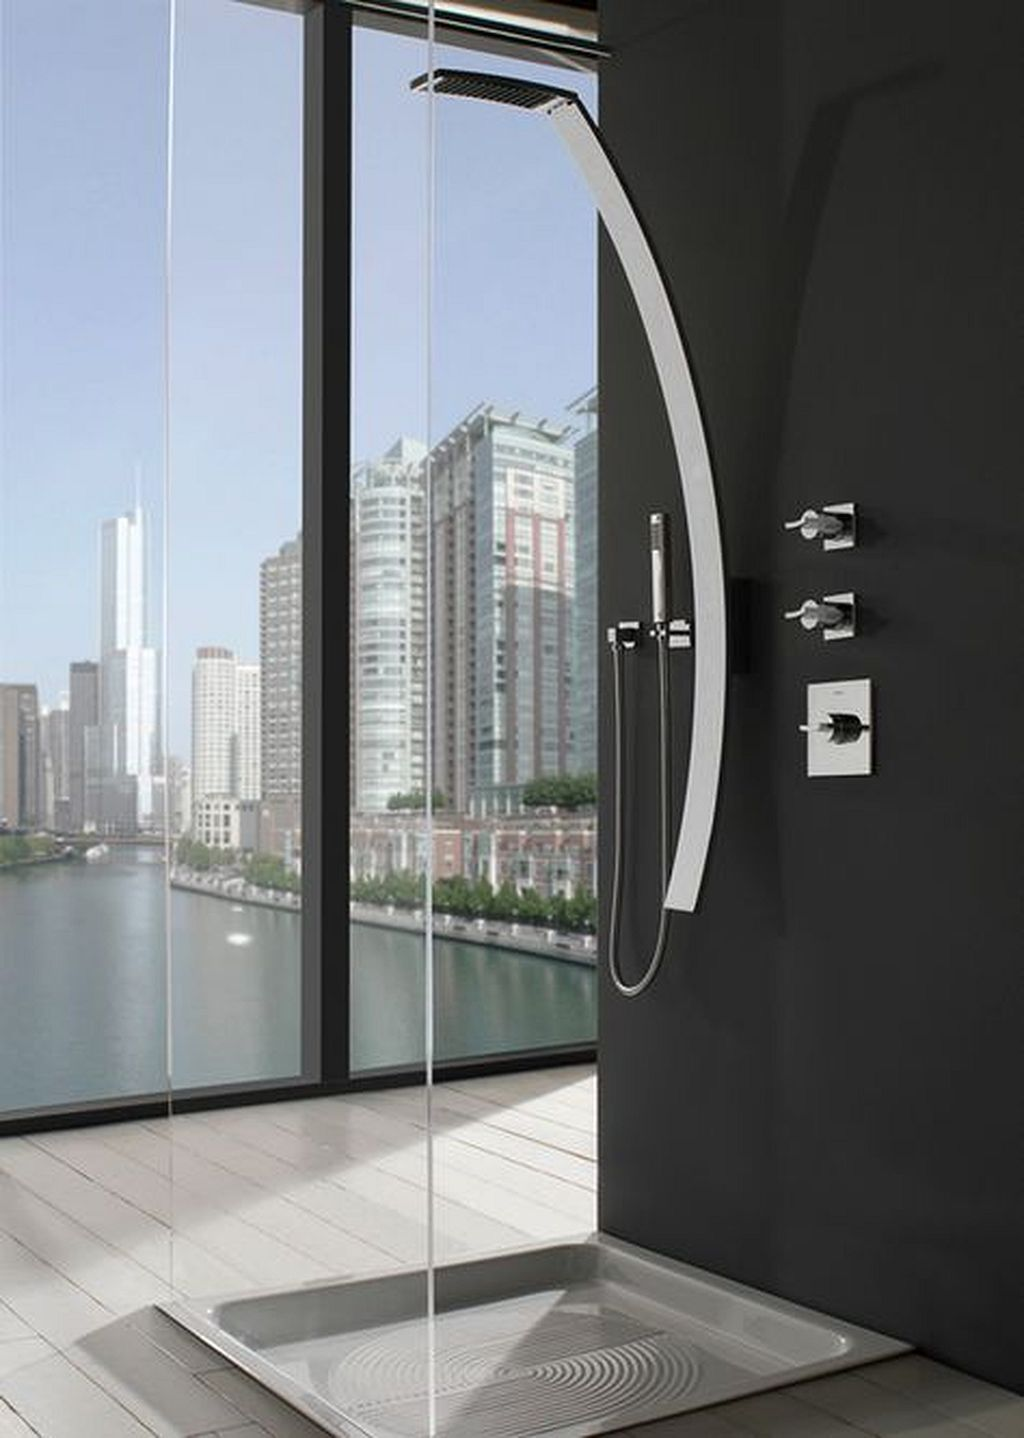 Awesome shower designs - 71 Awesome Shower Design Ideas